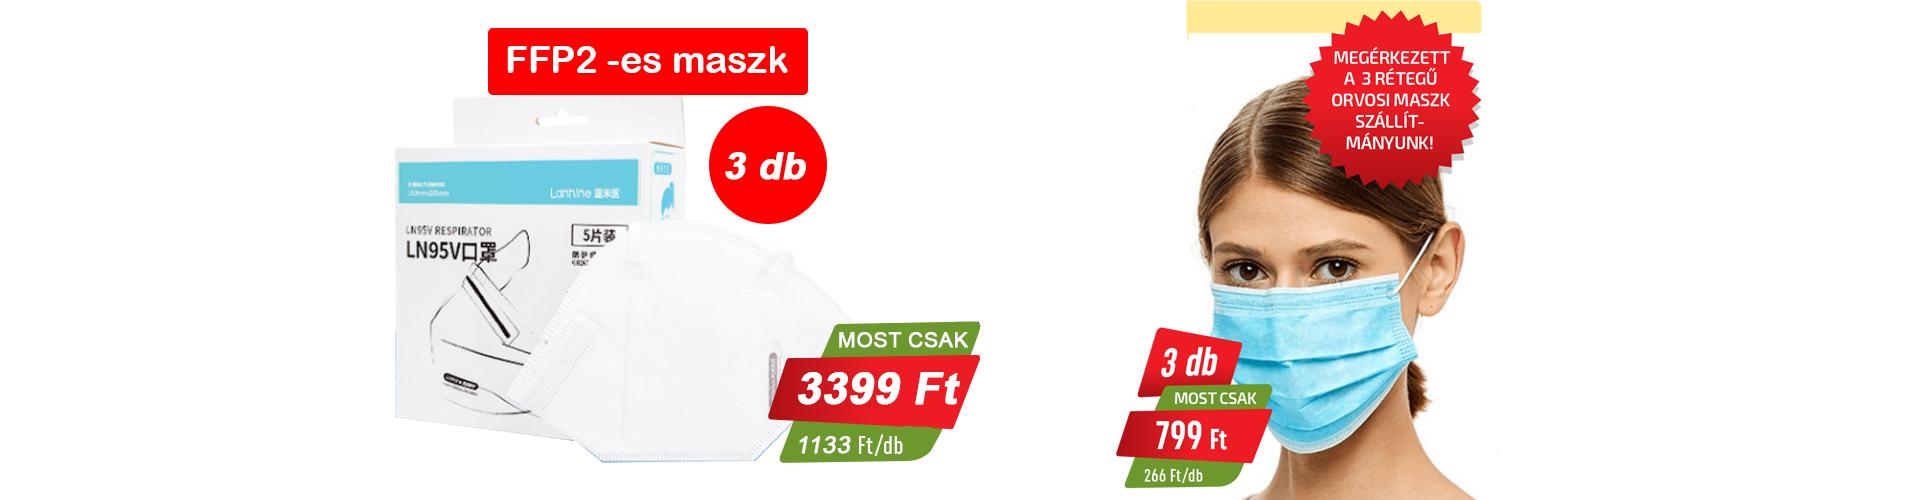 maszk